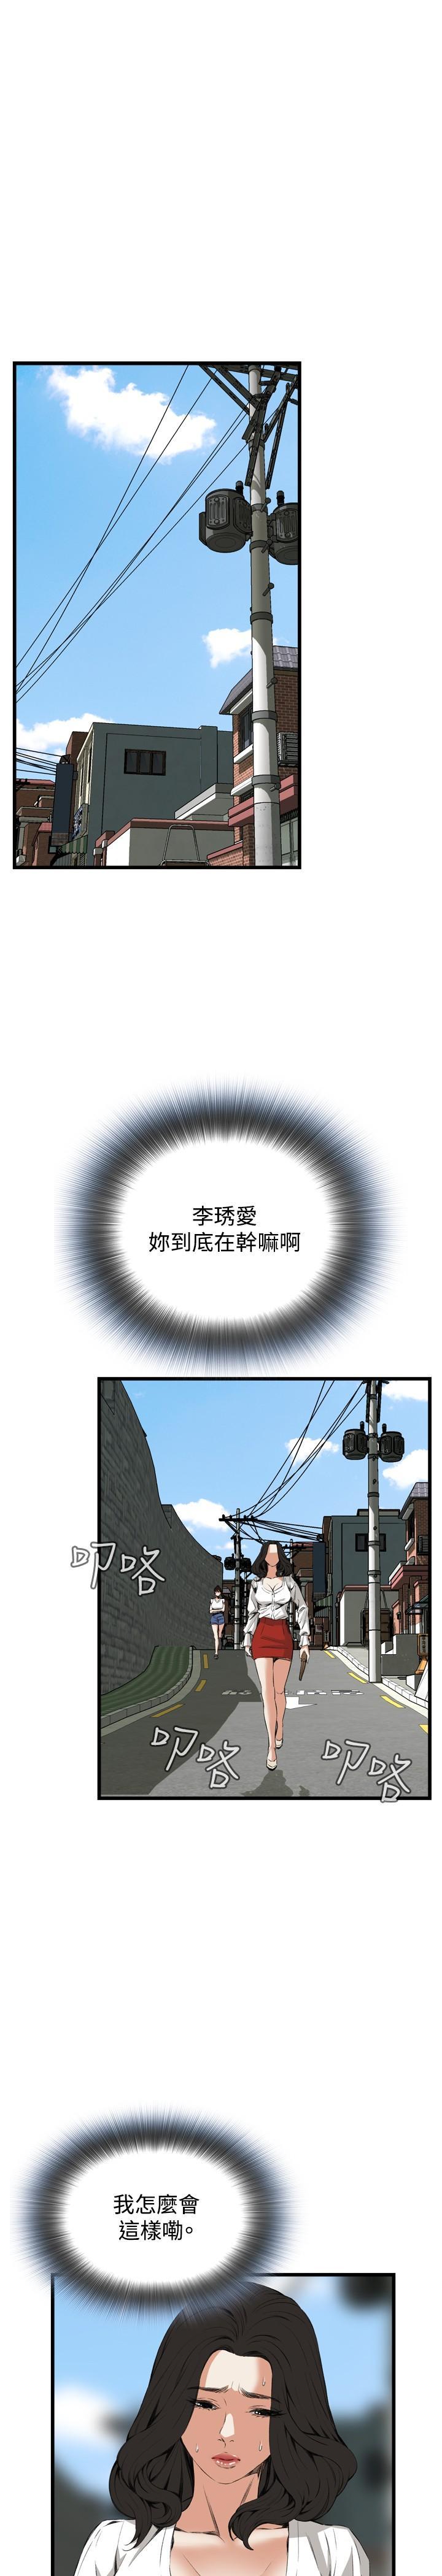 Take a Peek 偷窥 Ch.39~55 [Chinese]中文 409